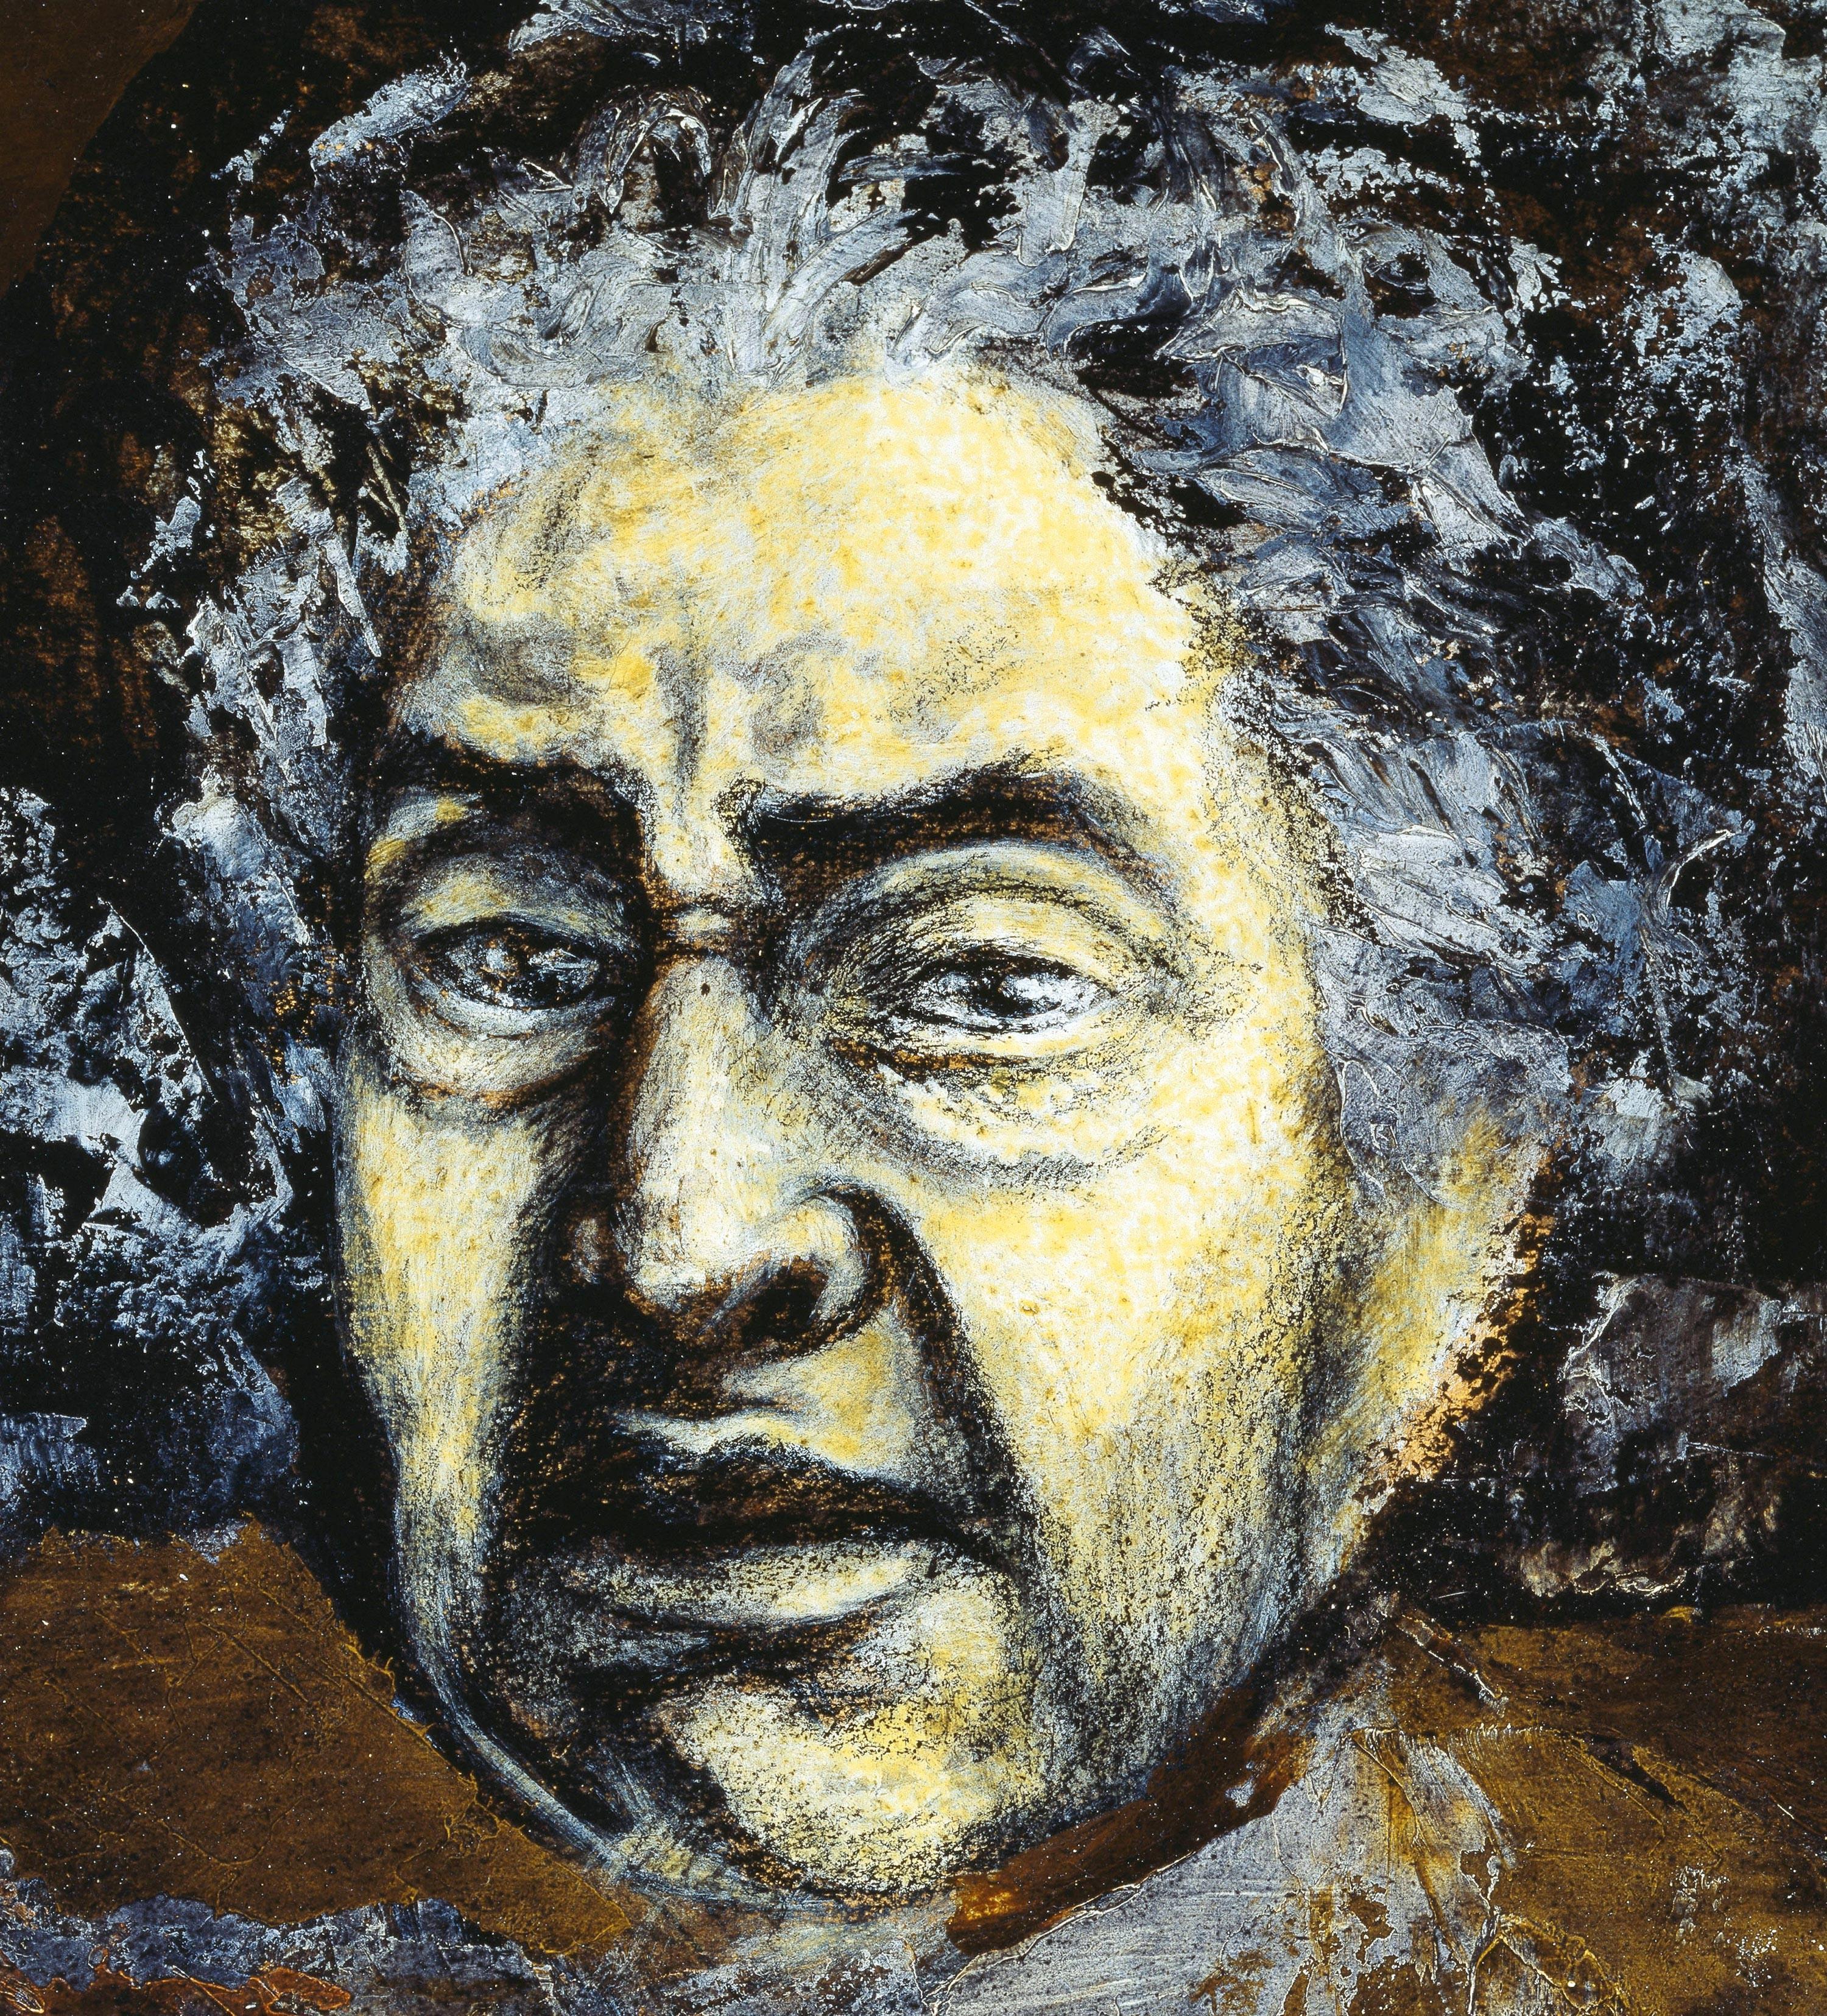 David Alfaro Siqueiros, Autorretrato, 1953.